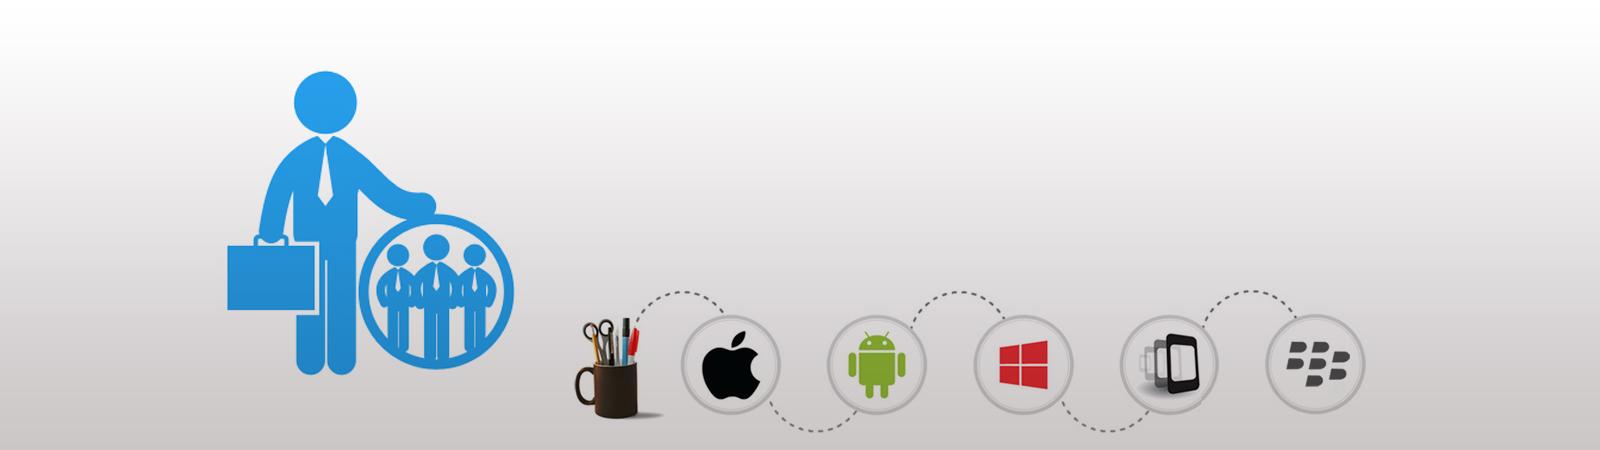 Hire iPhone, ipad, android, blackberry, windows mobile app developers India, USA, UK, Canada, Australia